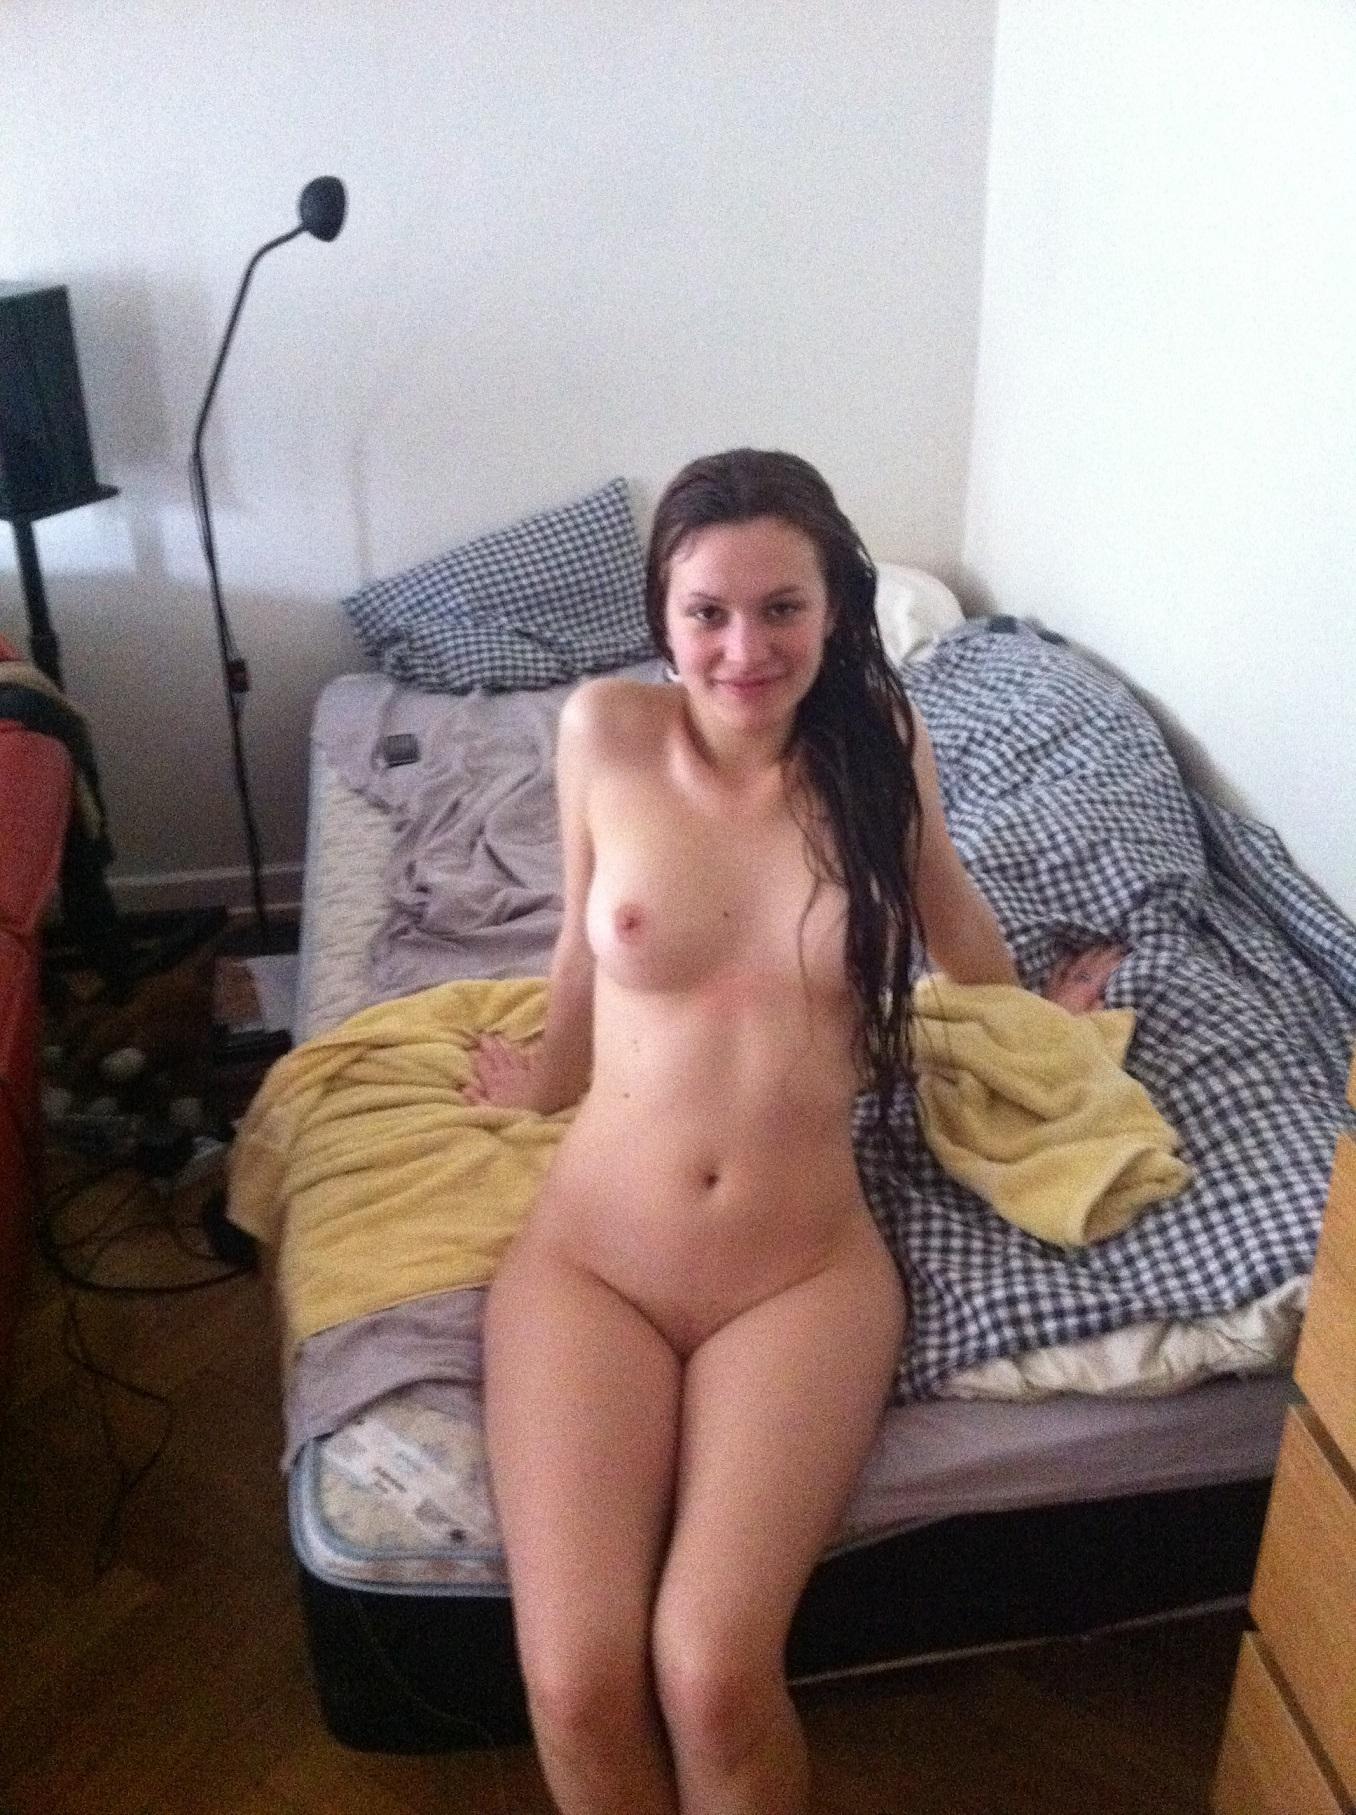 ex-girlfriend-nude-amateurs-girls-private-photo-mix-vol4-57